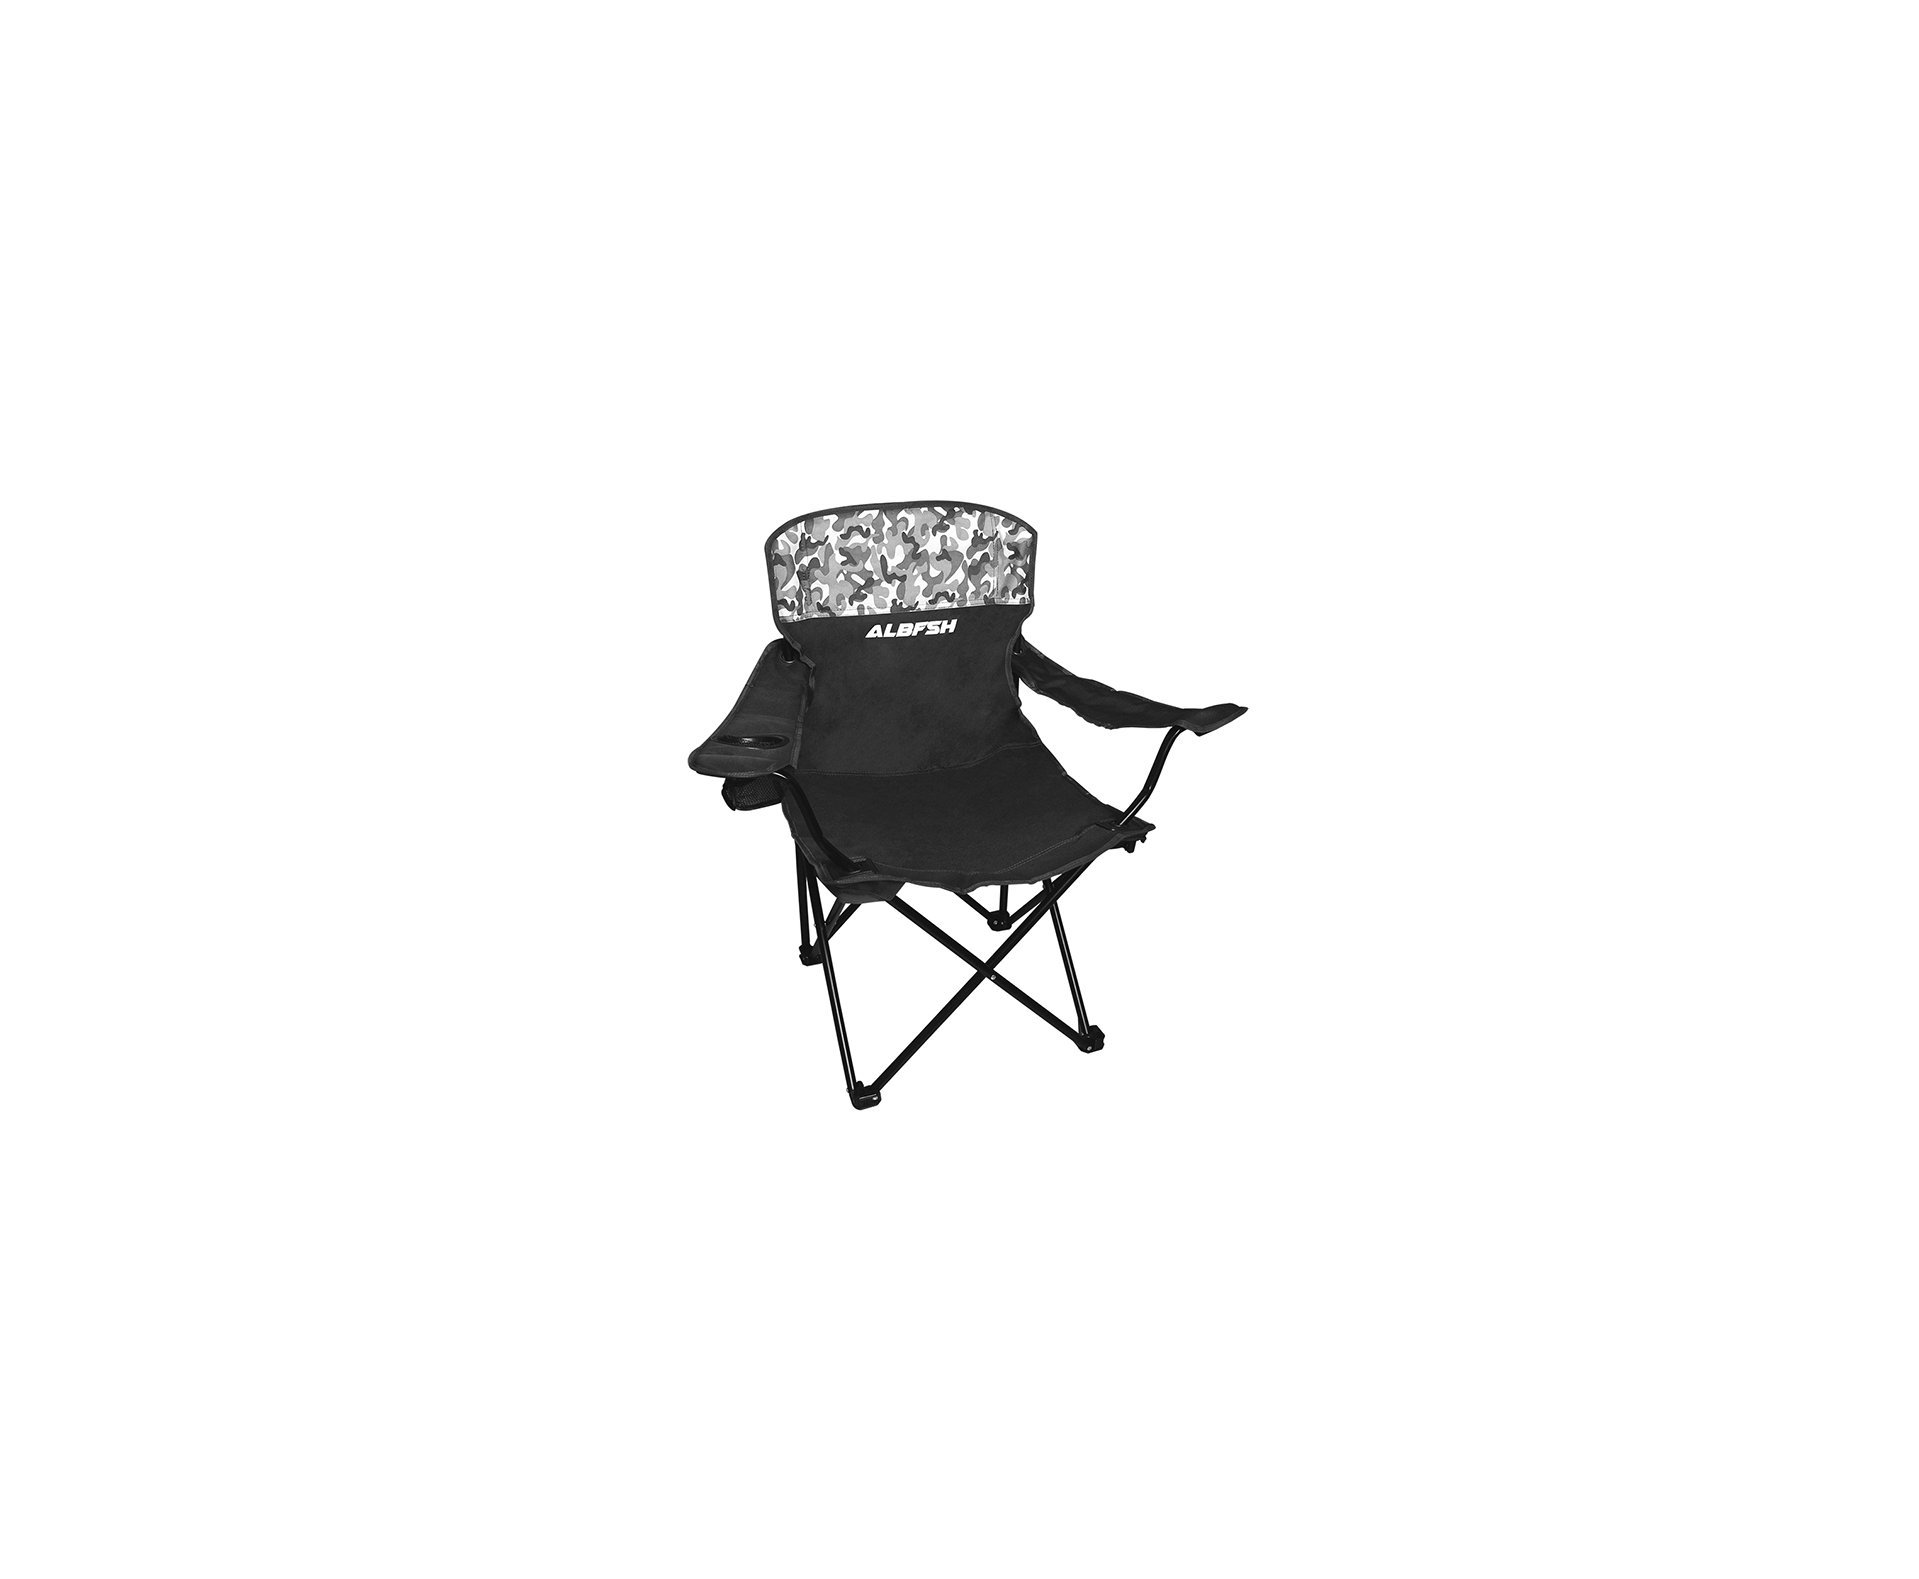 Cadeira Camping Albatroz Hba-23mh Capacidade 100kg